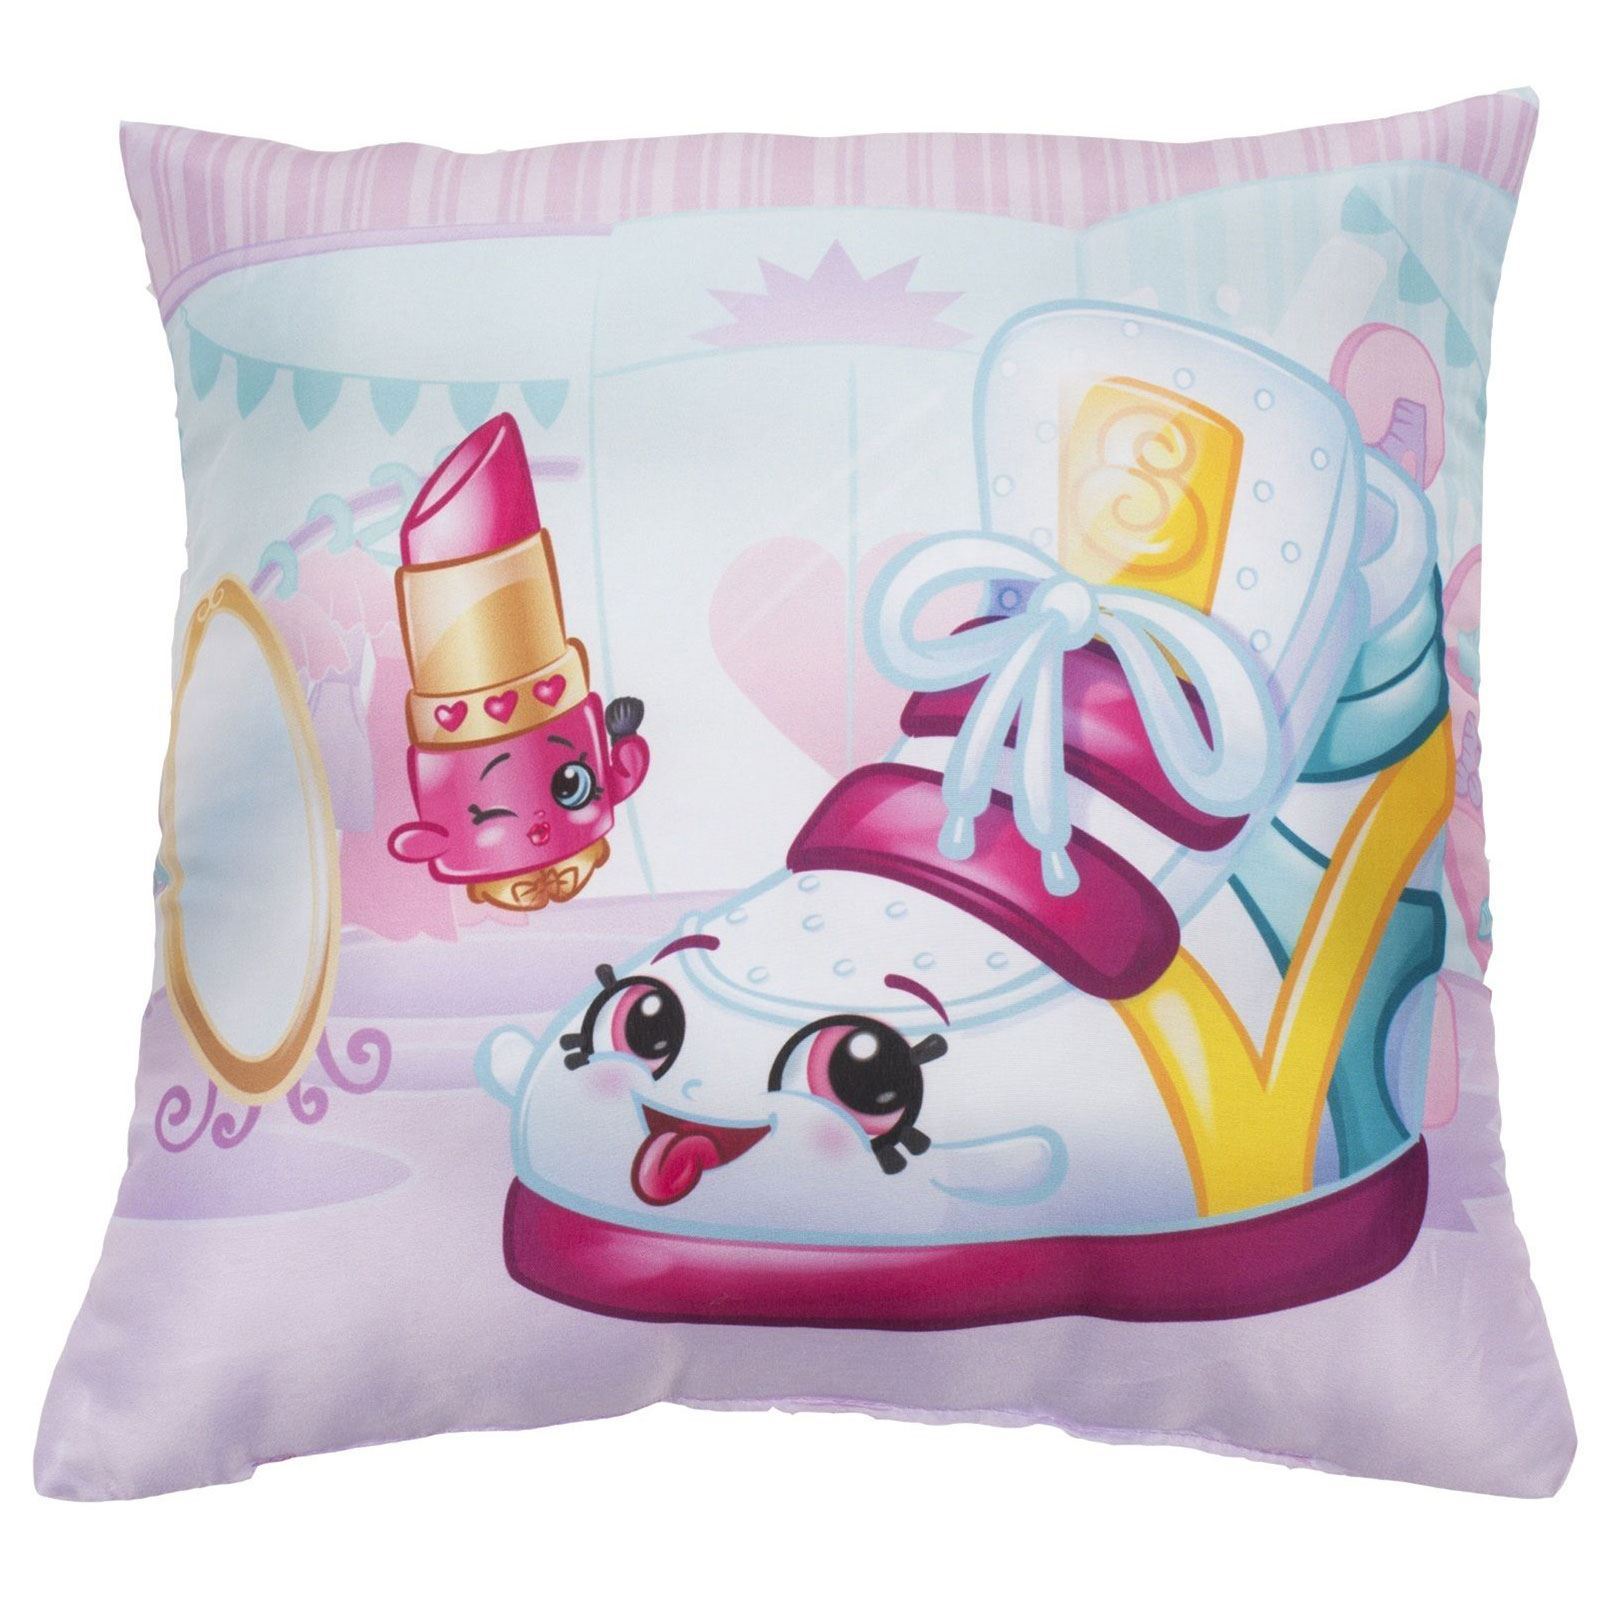 Peppa Pig Bedroom Stuff Girls Disney Amp Character Cushions Bedroom Frozen Minnie